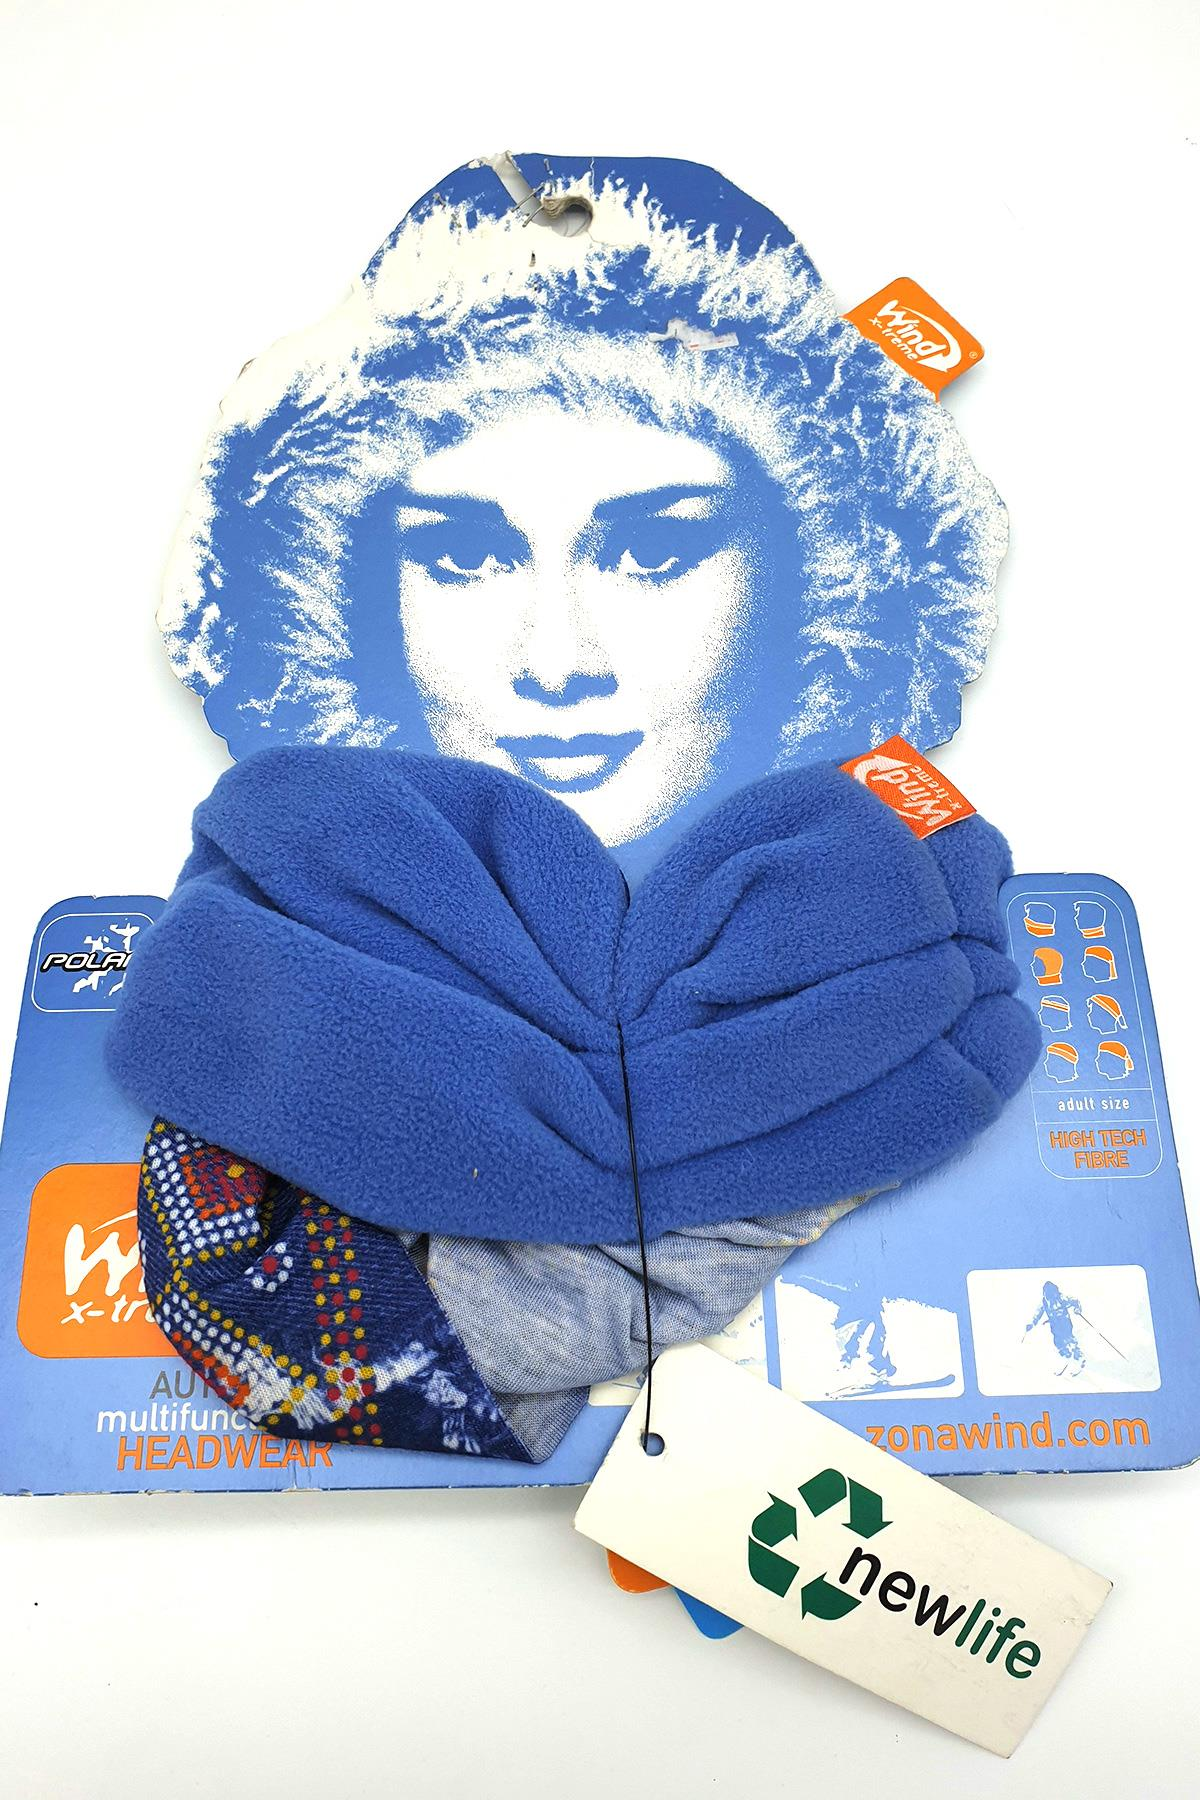 Wind Extreme Polar Headwear Jeans Wdwp210